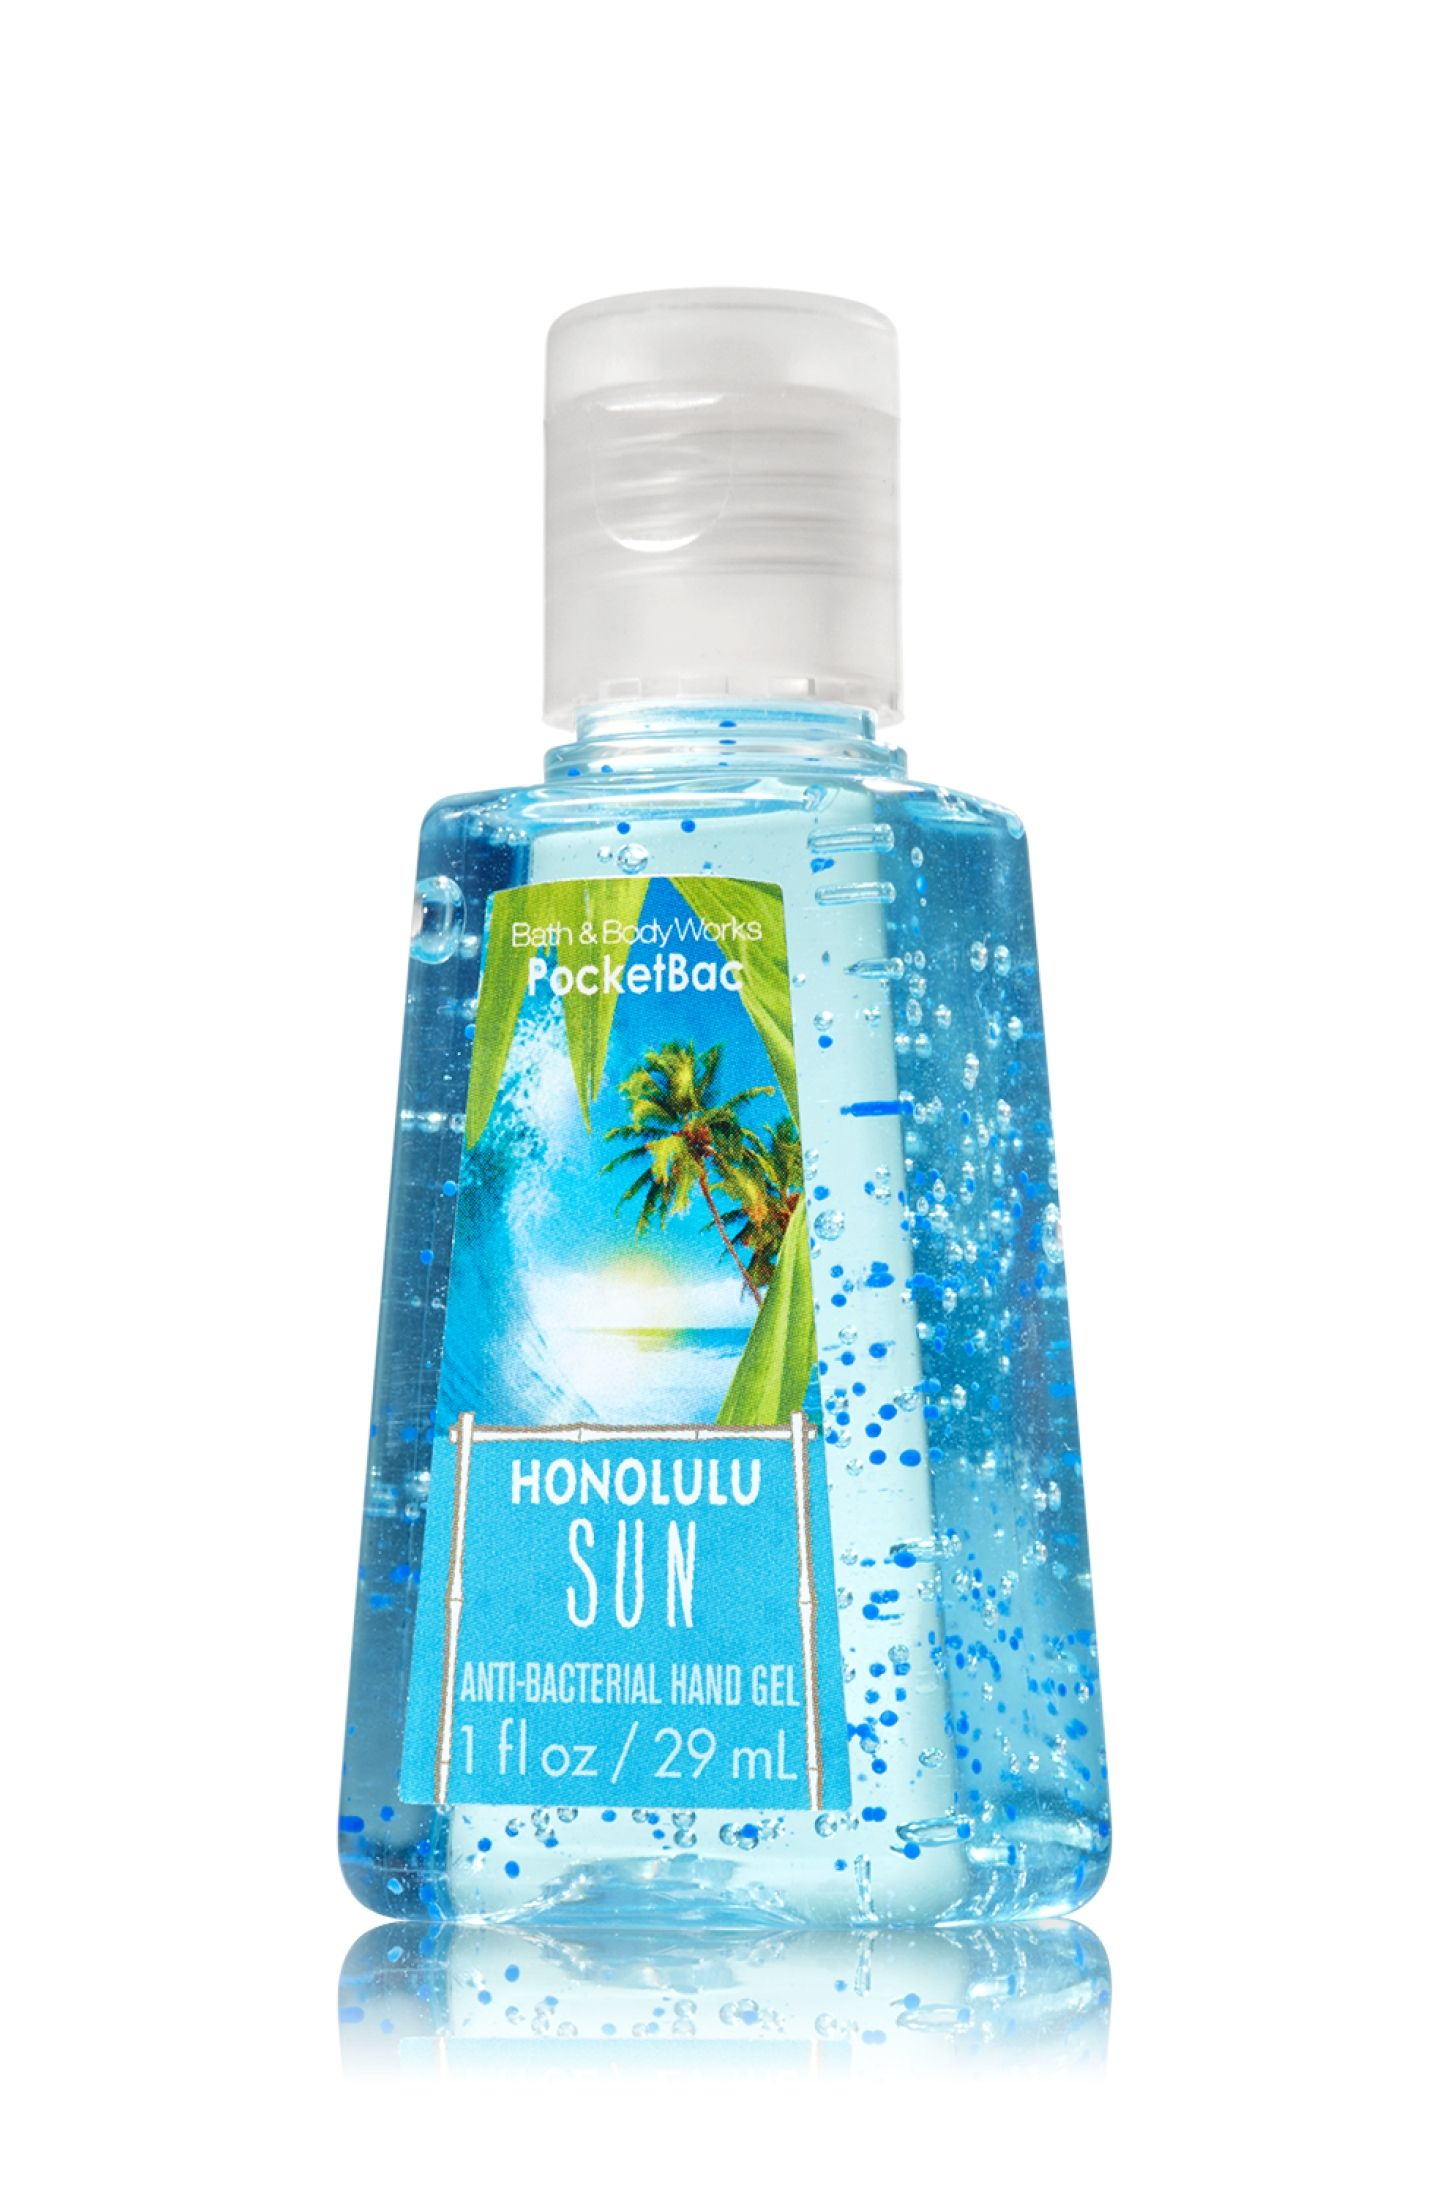 Honolulu Sun Coconut Bath & Body Works PocketBac Sanitizing Hand Gel ...